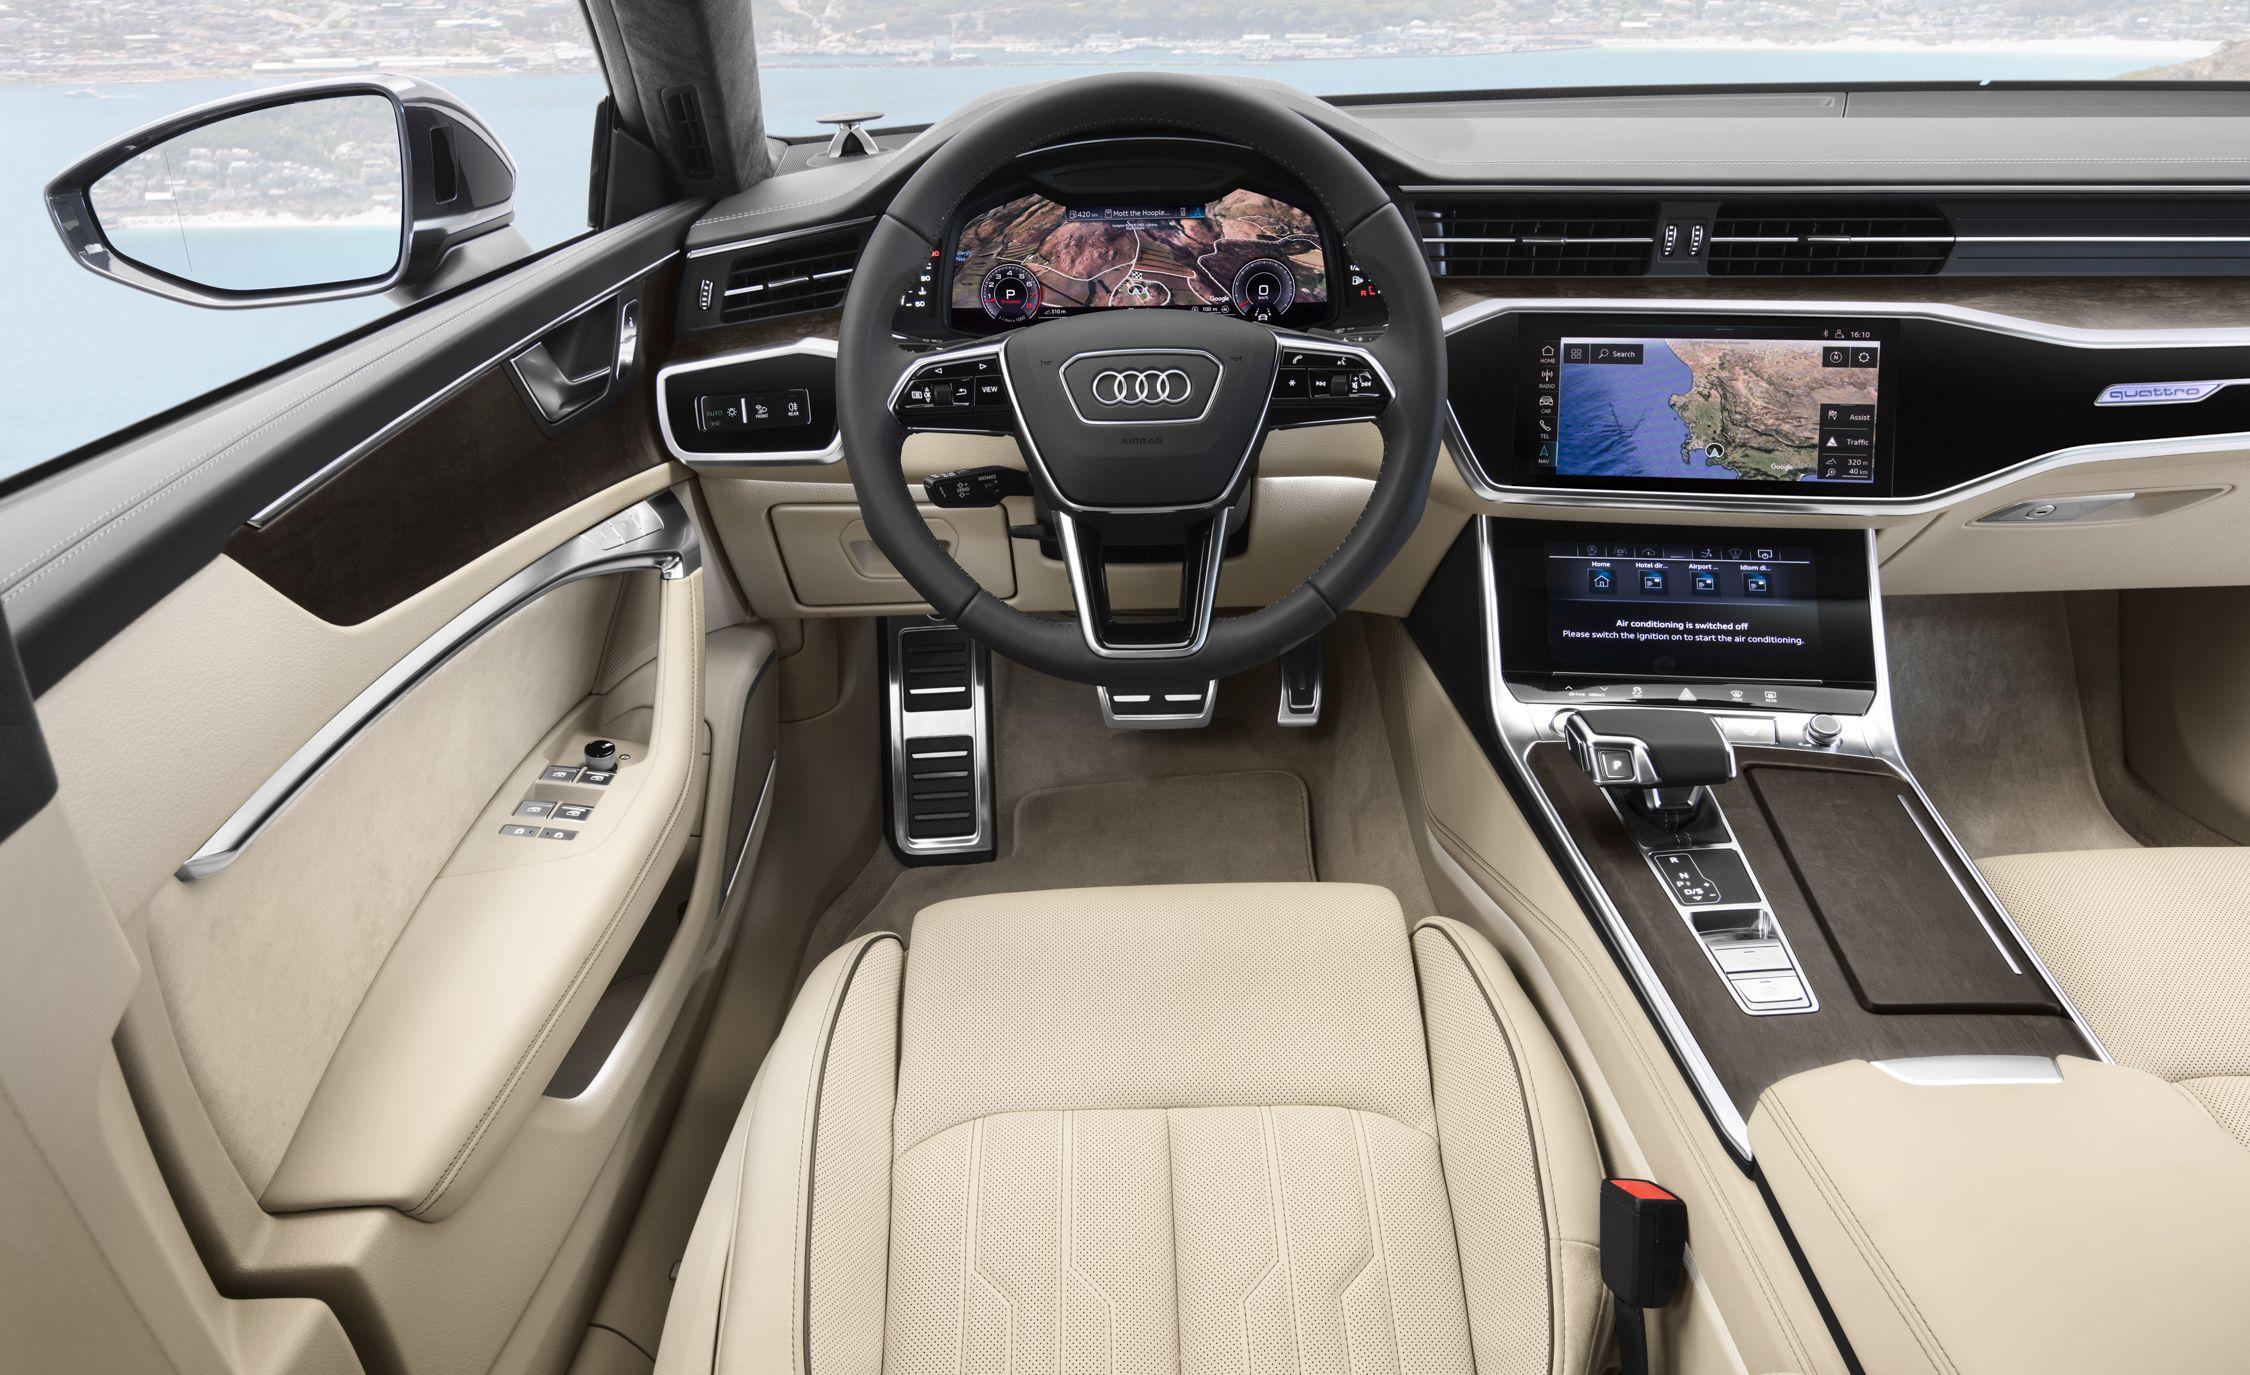 2019-Audi-A7-Sportback-180-1.jpg